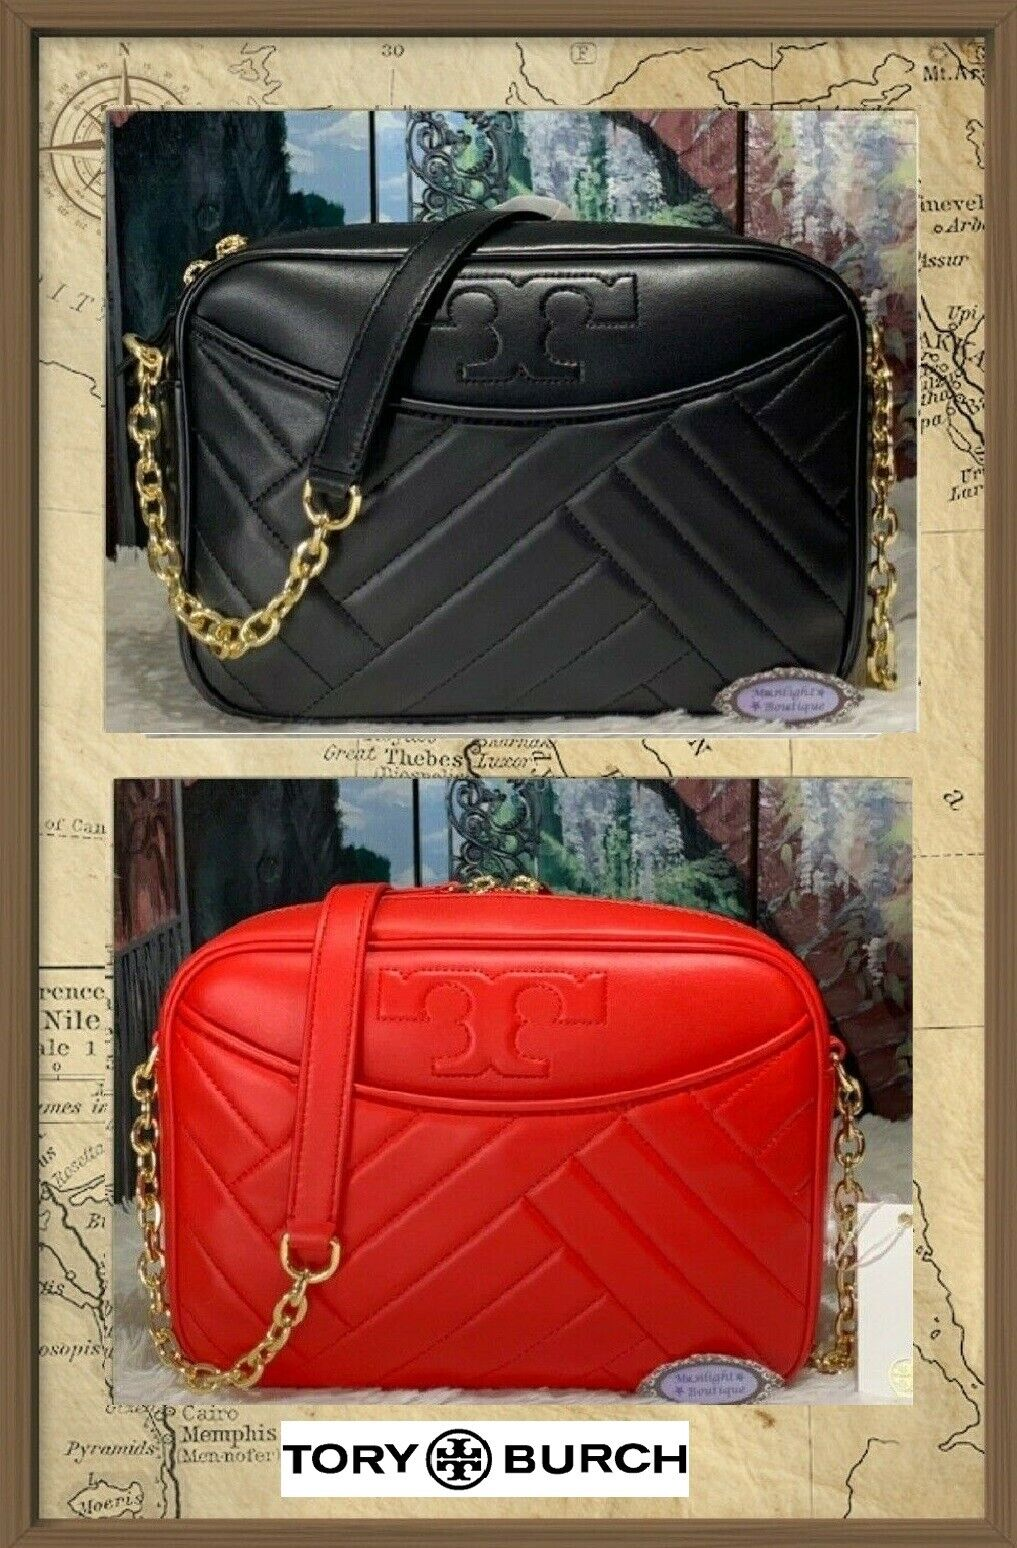 NWT TORY BURCH ALEXA STITCH CAMERA X-body Bag In BLACK or RE